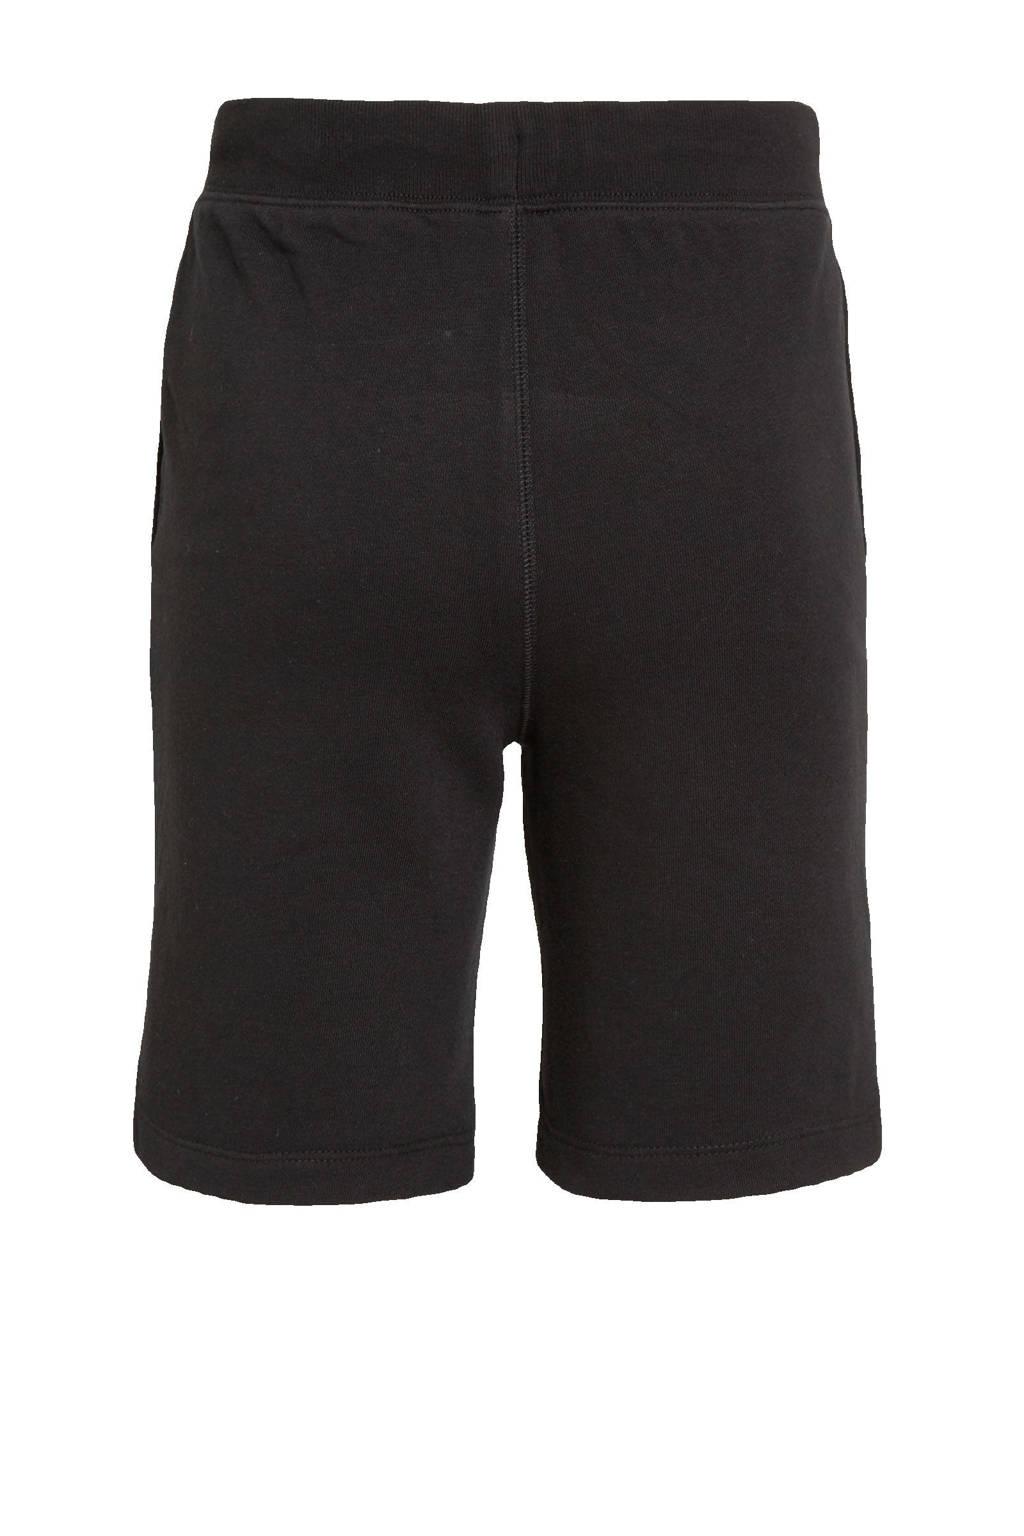 GAP regular fit sweatshort zwart, Zwart